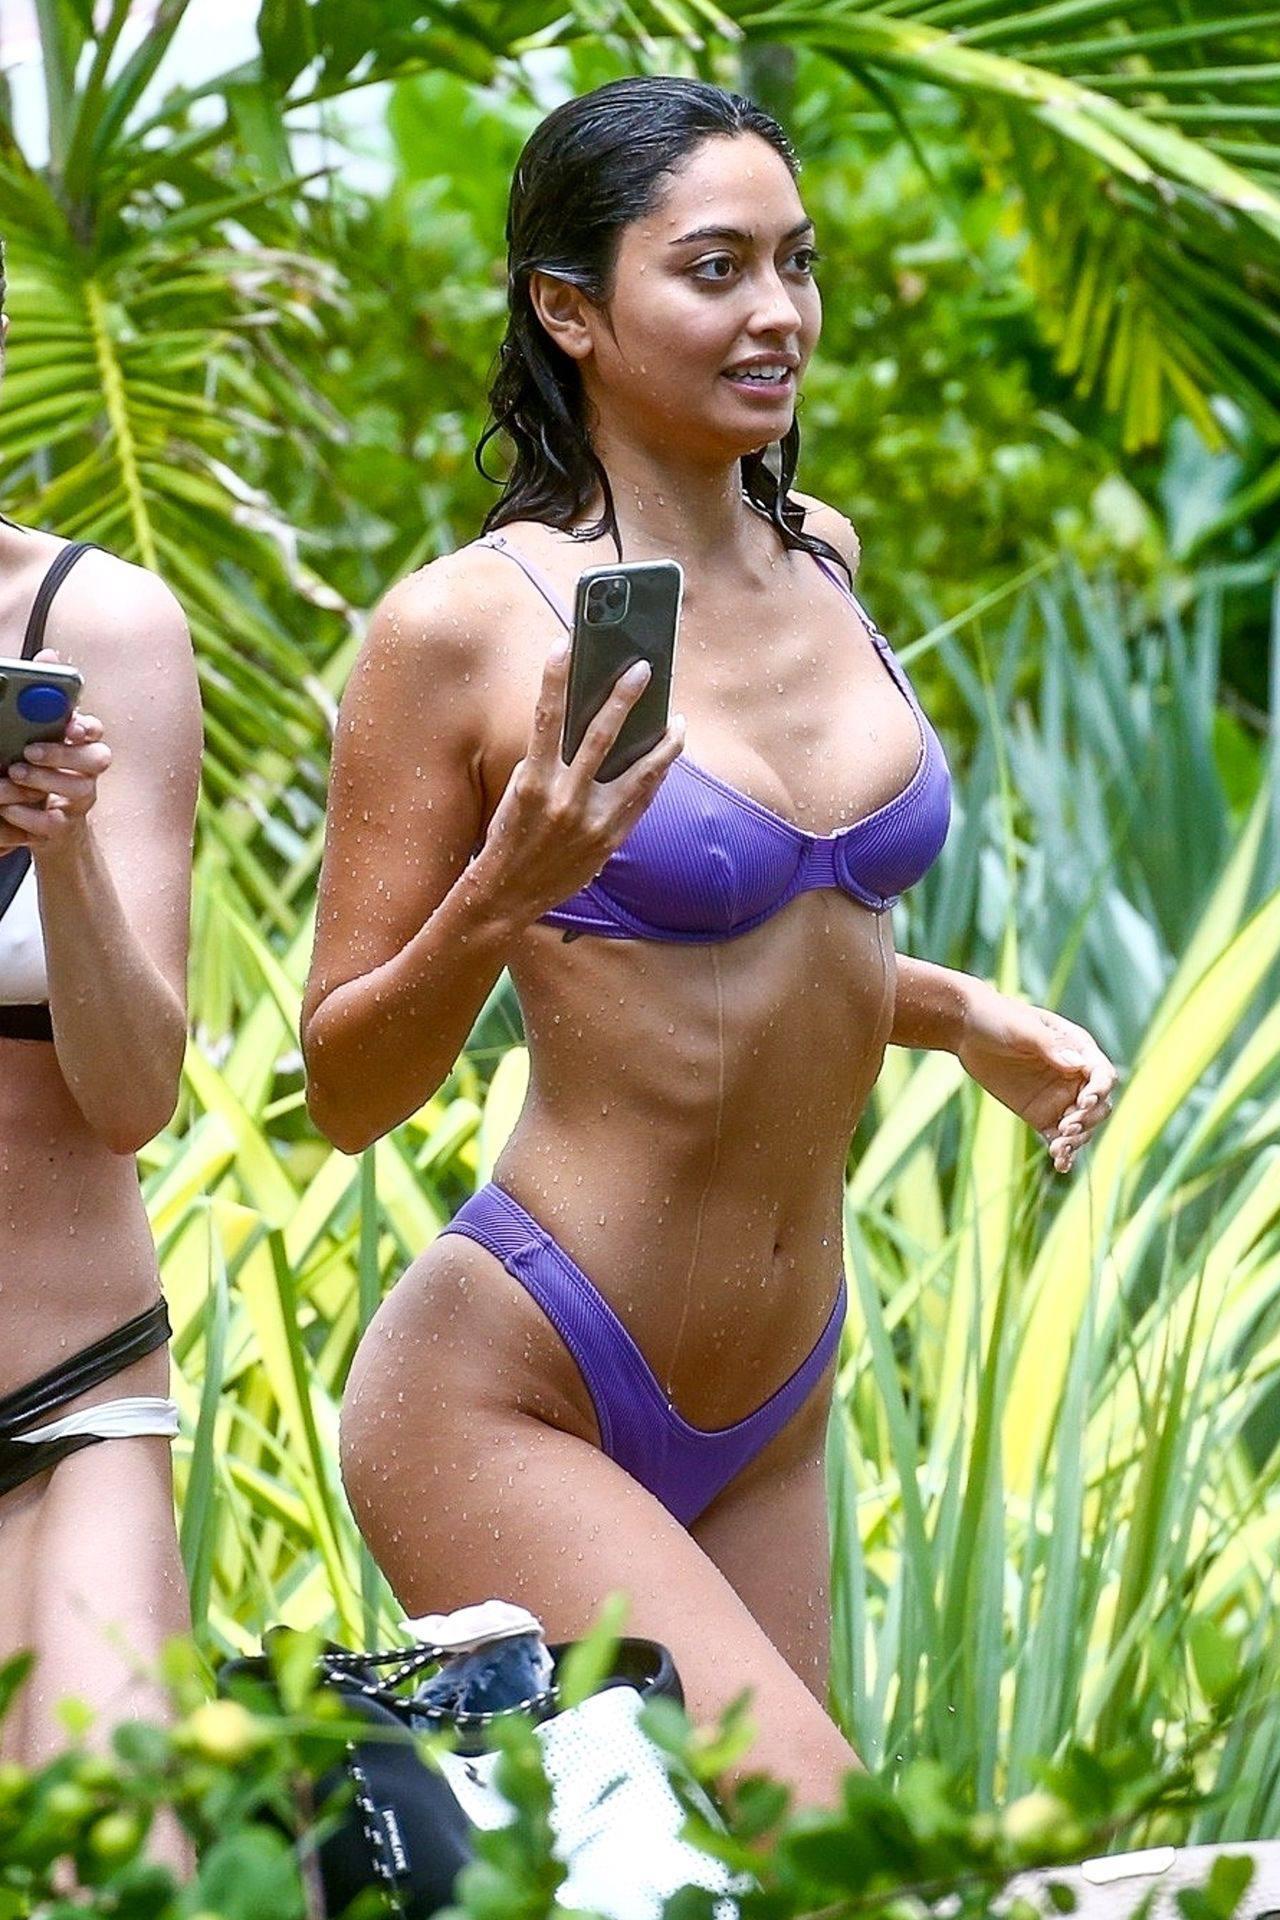 Ambra Gutierrez – Hot Body In Small Bikini On Beach In Miami Beach 0009